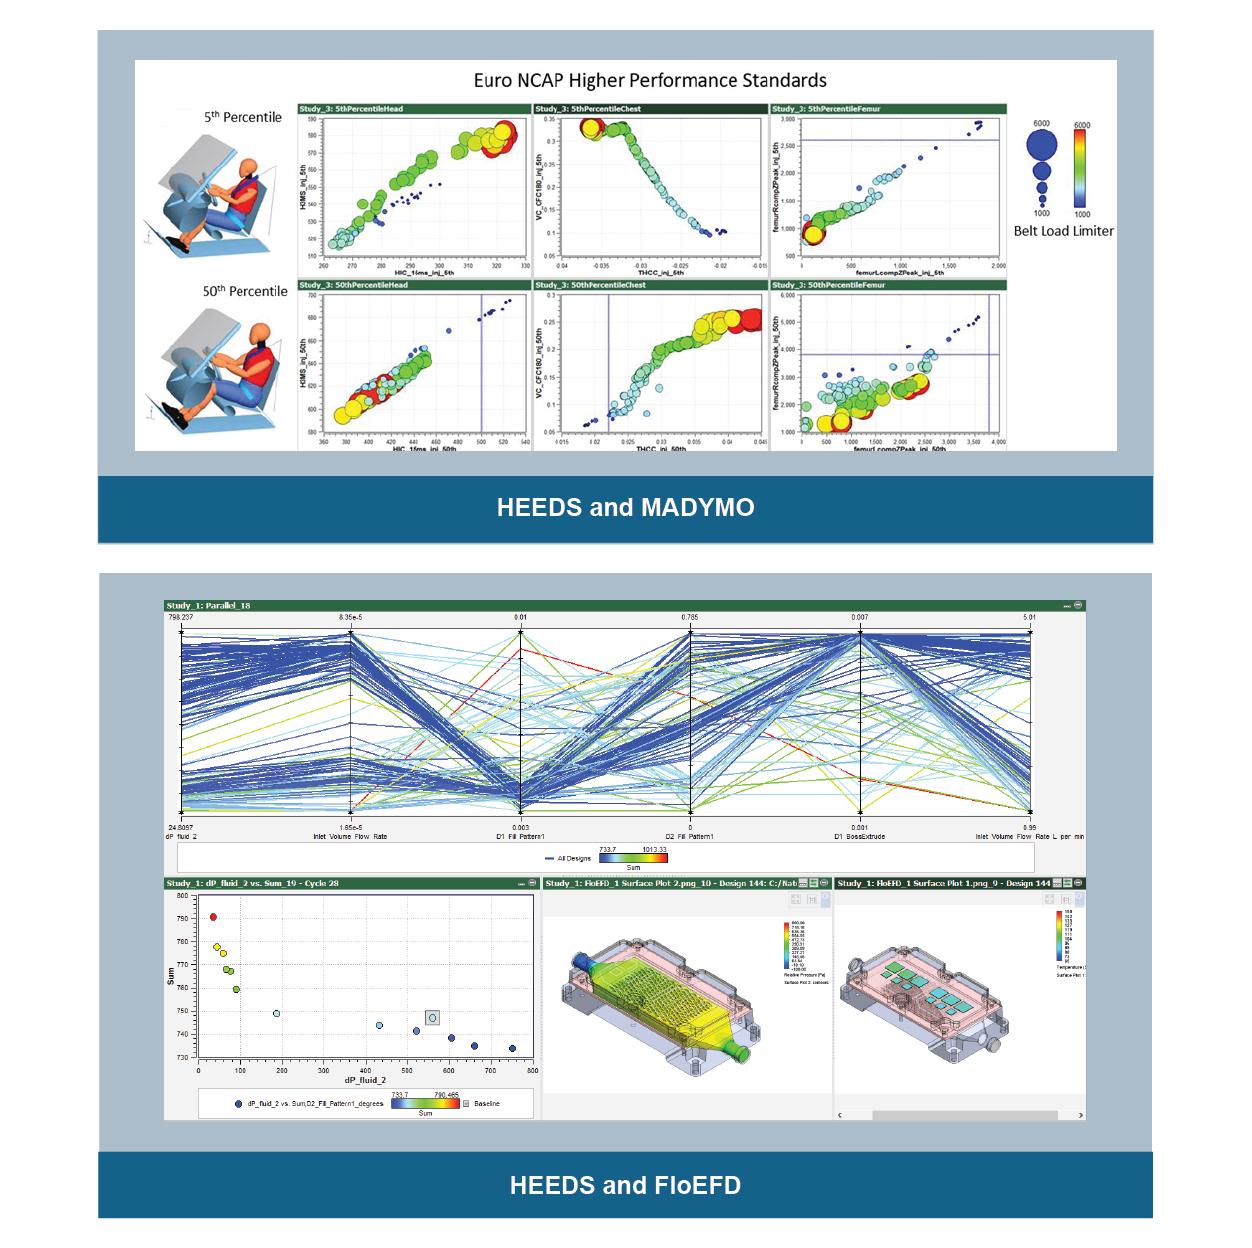 Siemens PLM Software - HEEDS Design Space Exploration Blog